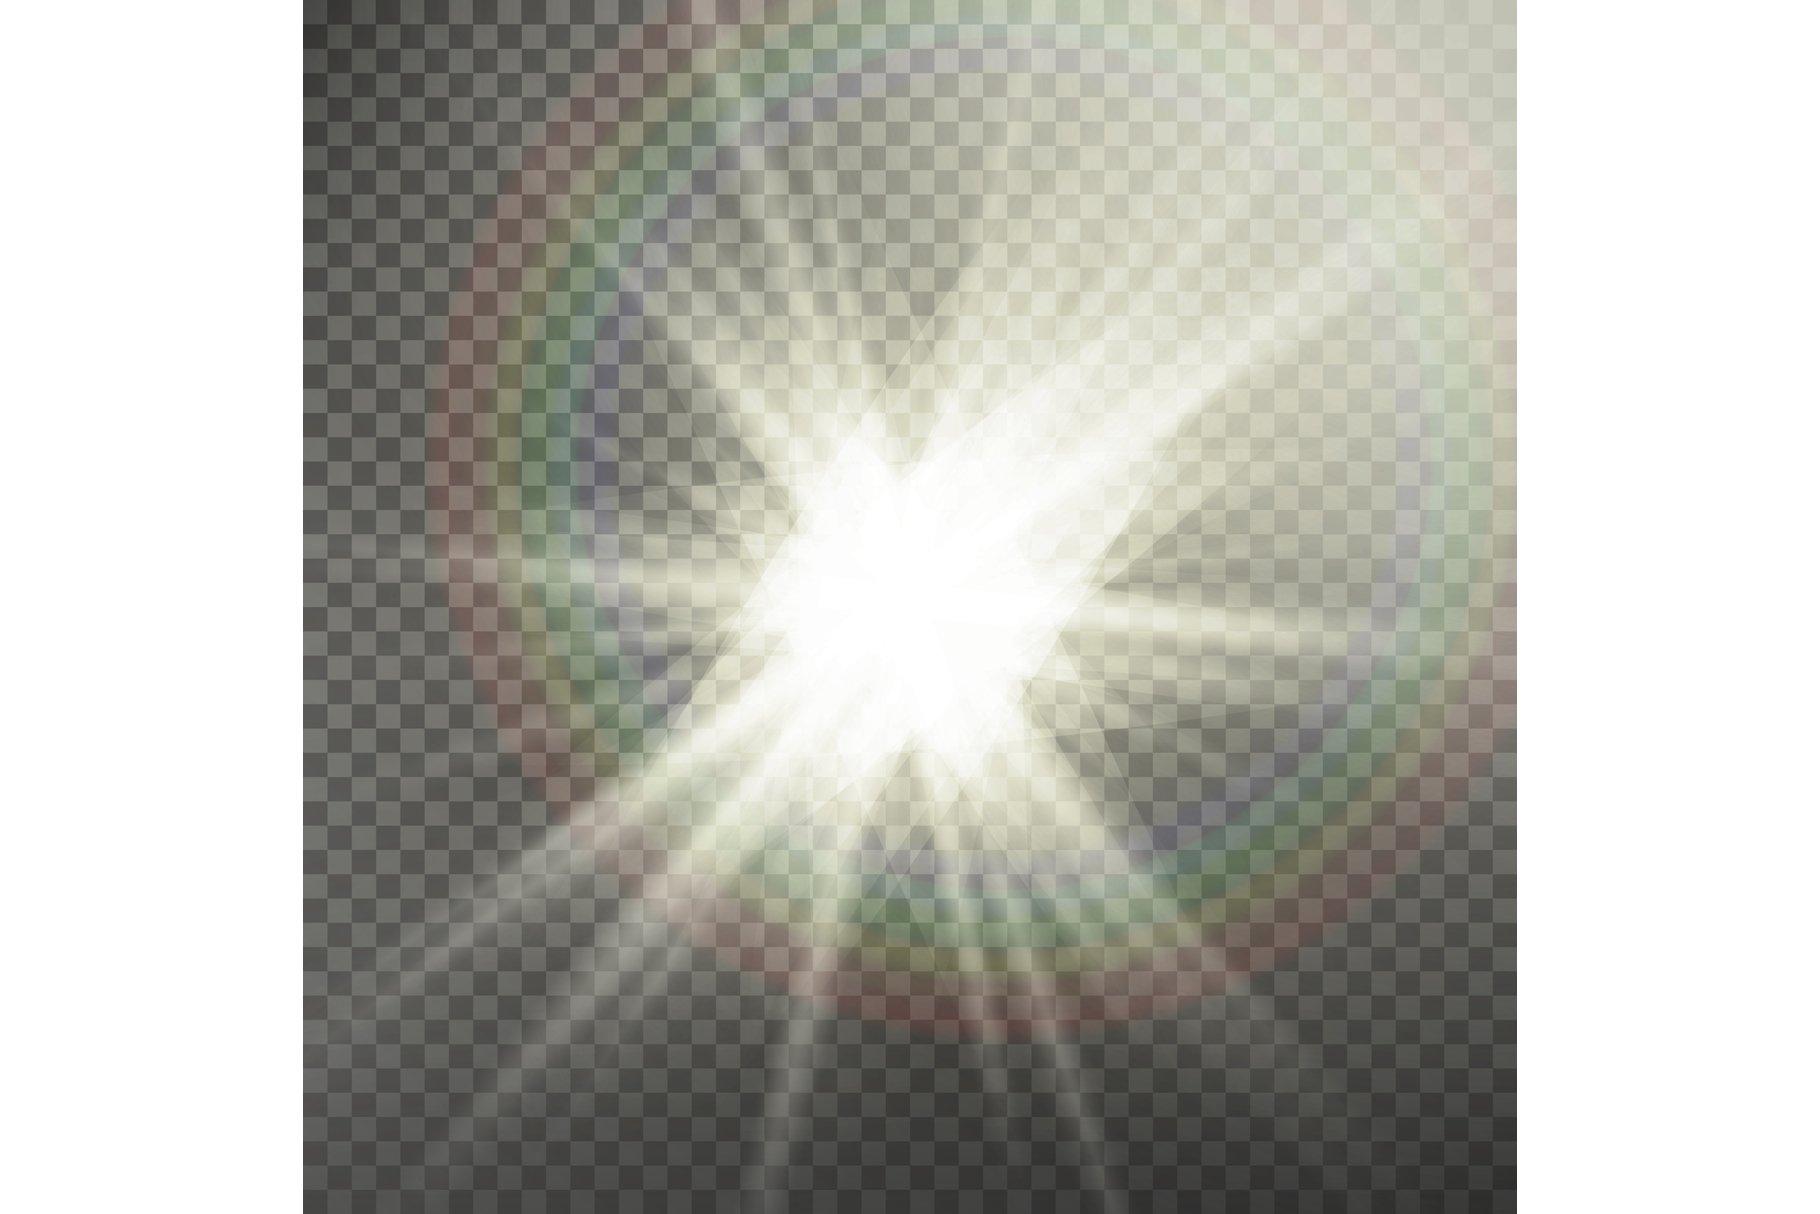 Sunlight Special Lens Flare Light Effect. Light Flare example image 1